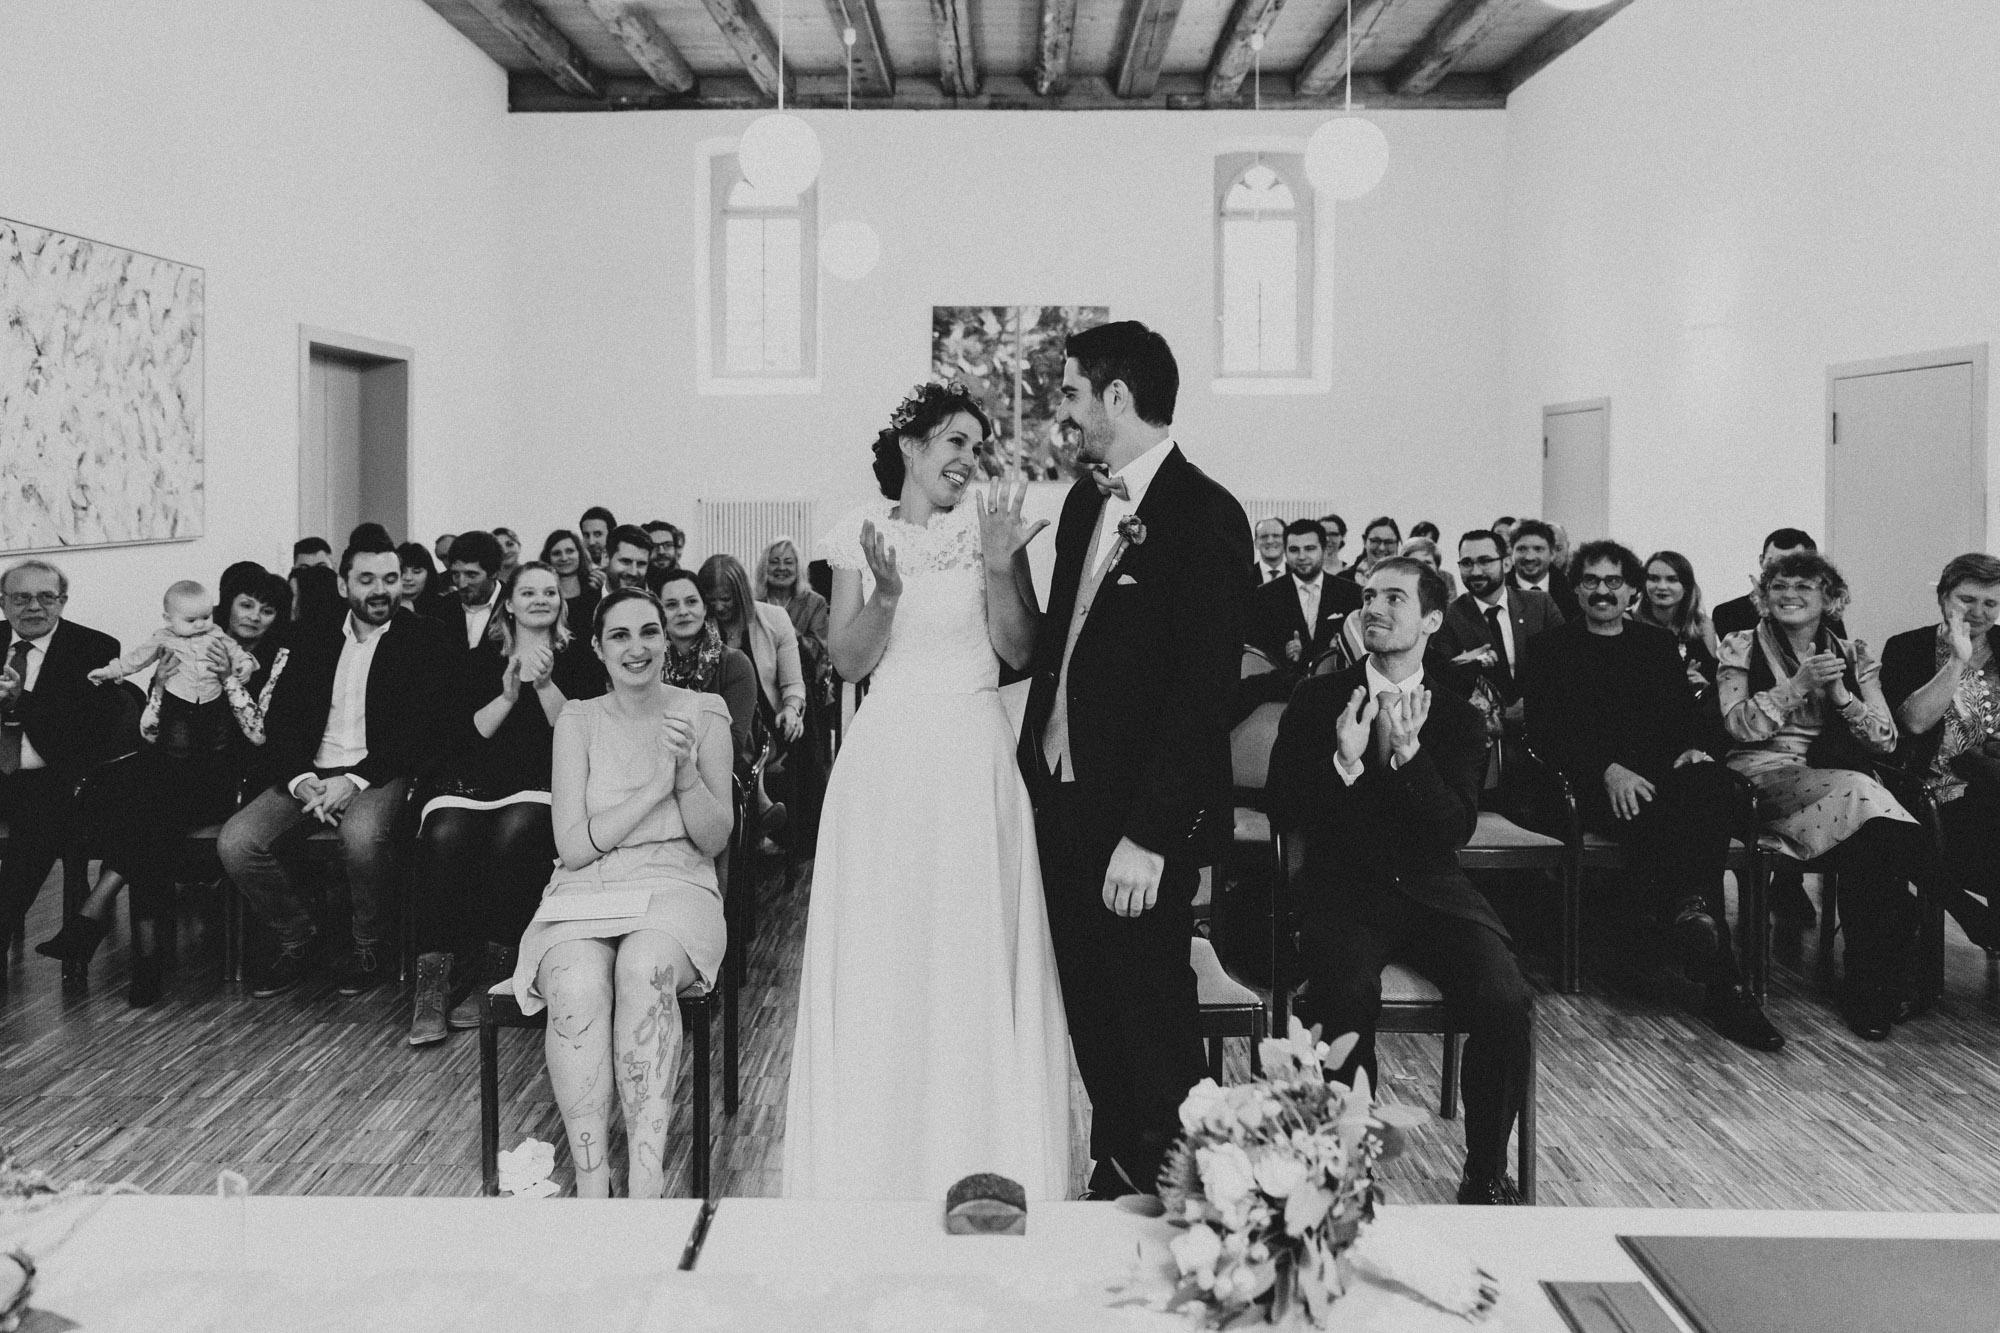 Hochzeitsfotografie-Karlsruhe-Ronja-Flo-6